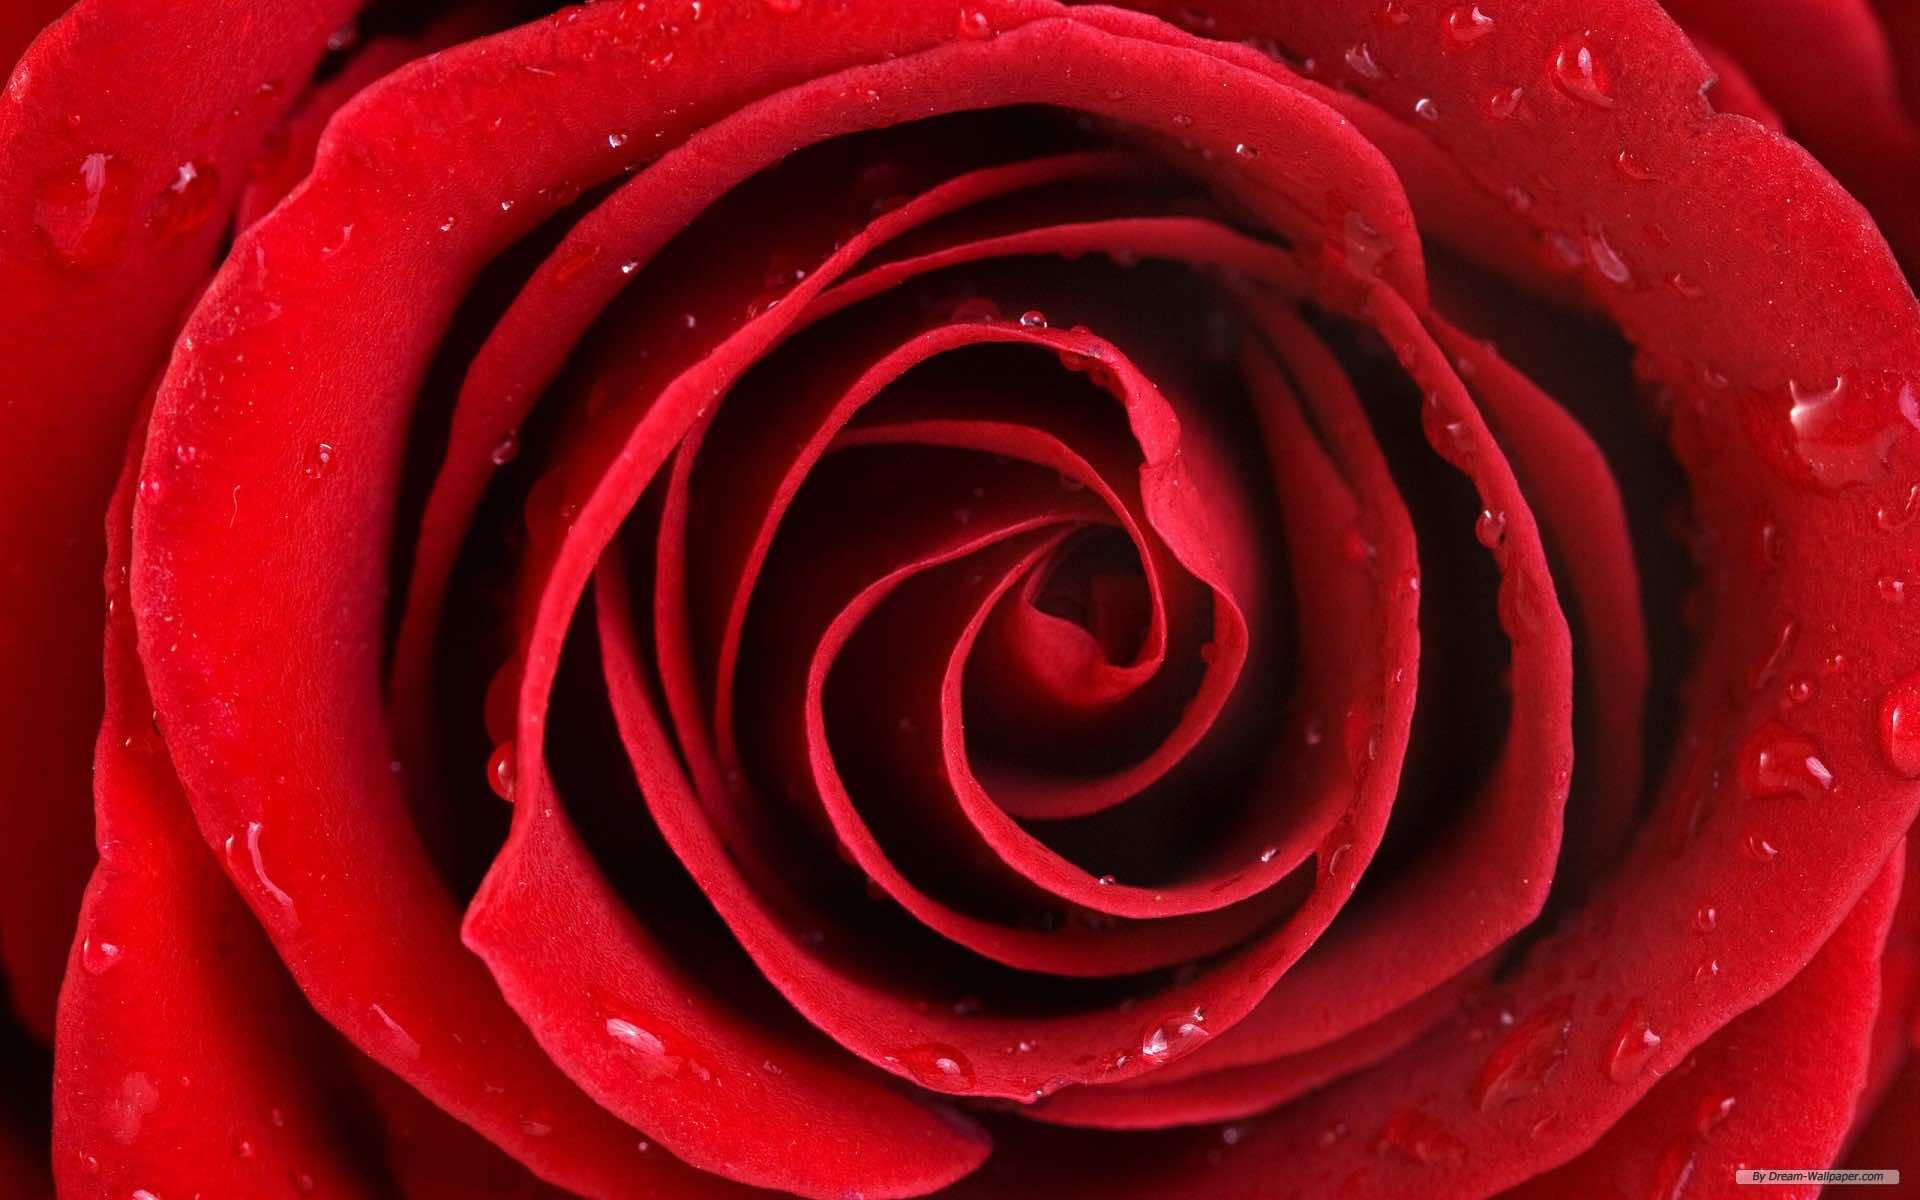 Falling Rose Petals Live Wallpaper 74 Rose Wallpaper For Hd Download